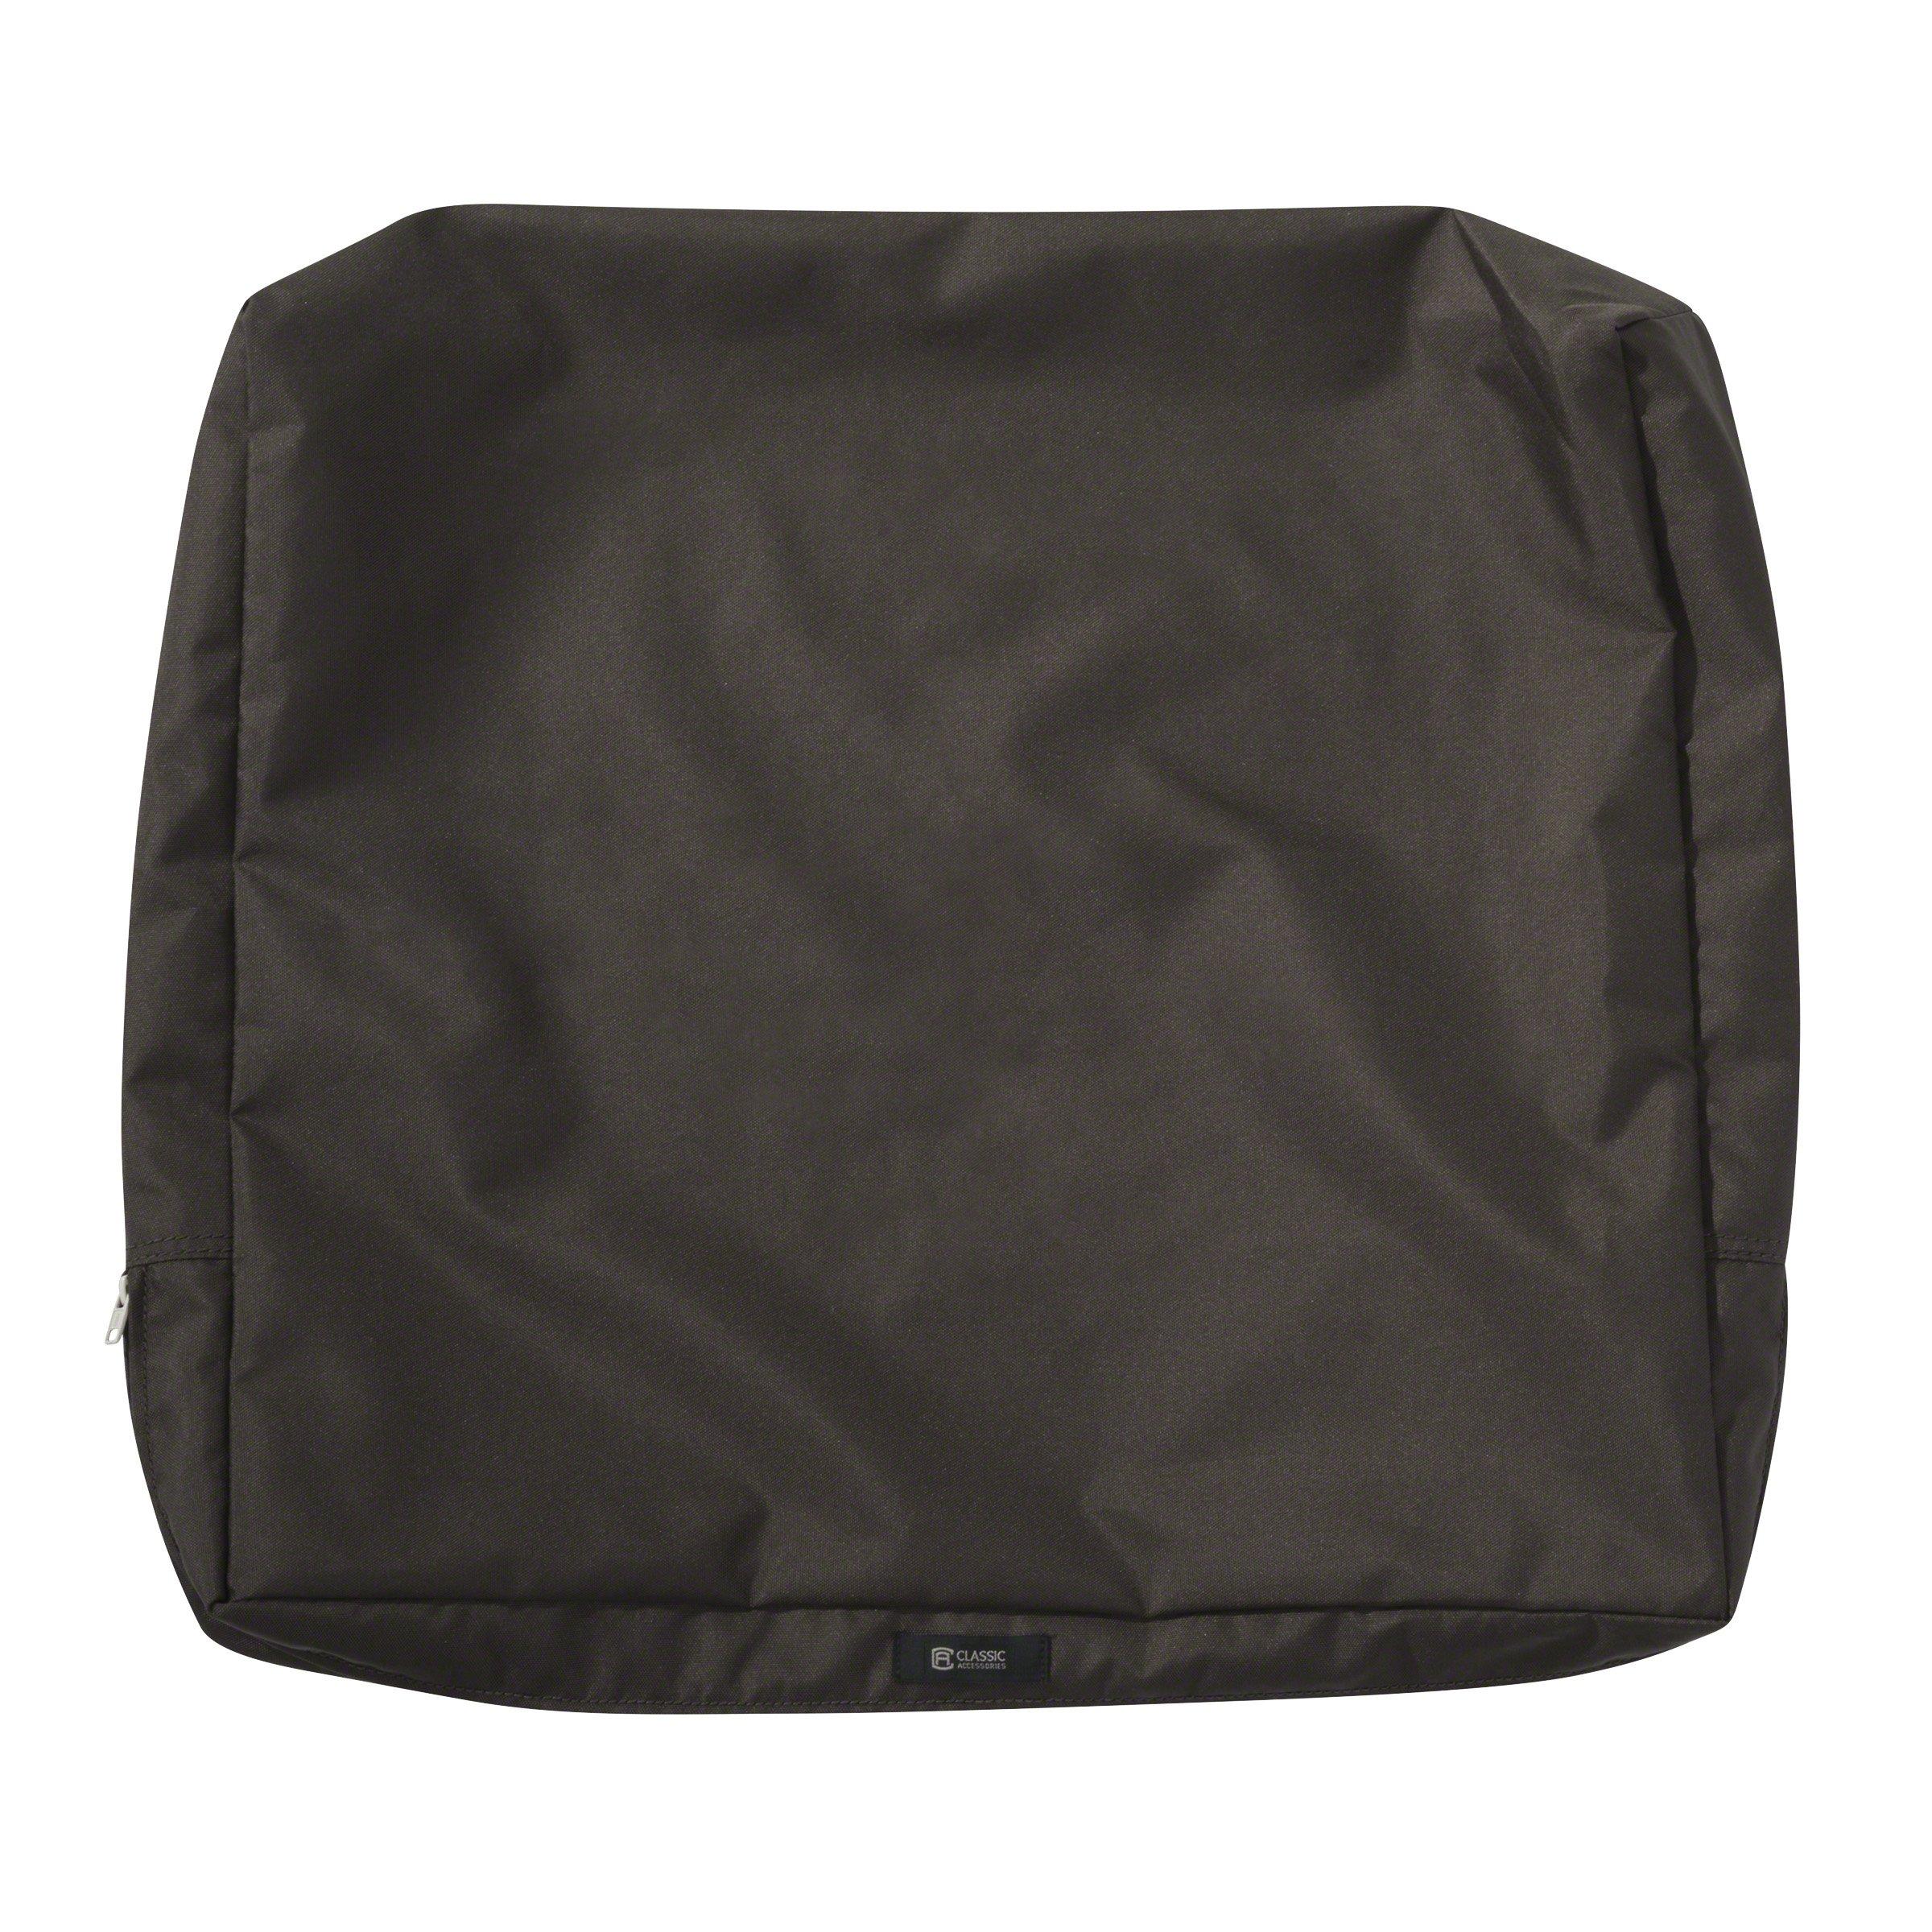 Classic Accessories Ravenna Water-Resistant 23 x 20 x 4 Inch Patio Back Cushion Slip Cover, Espresso